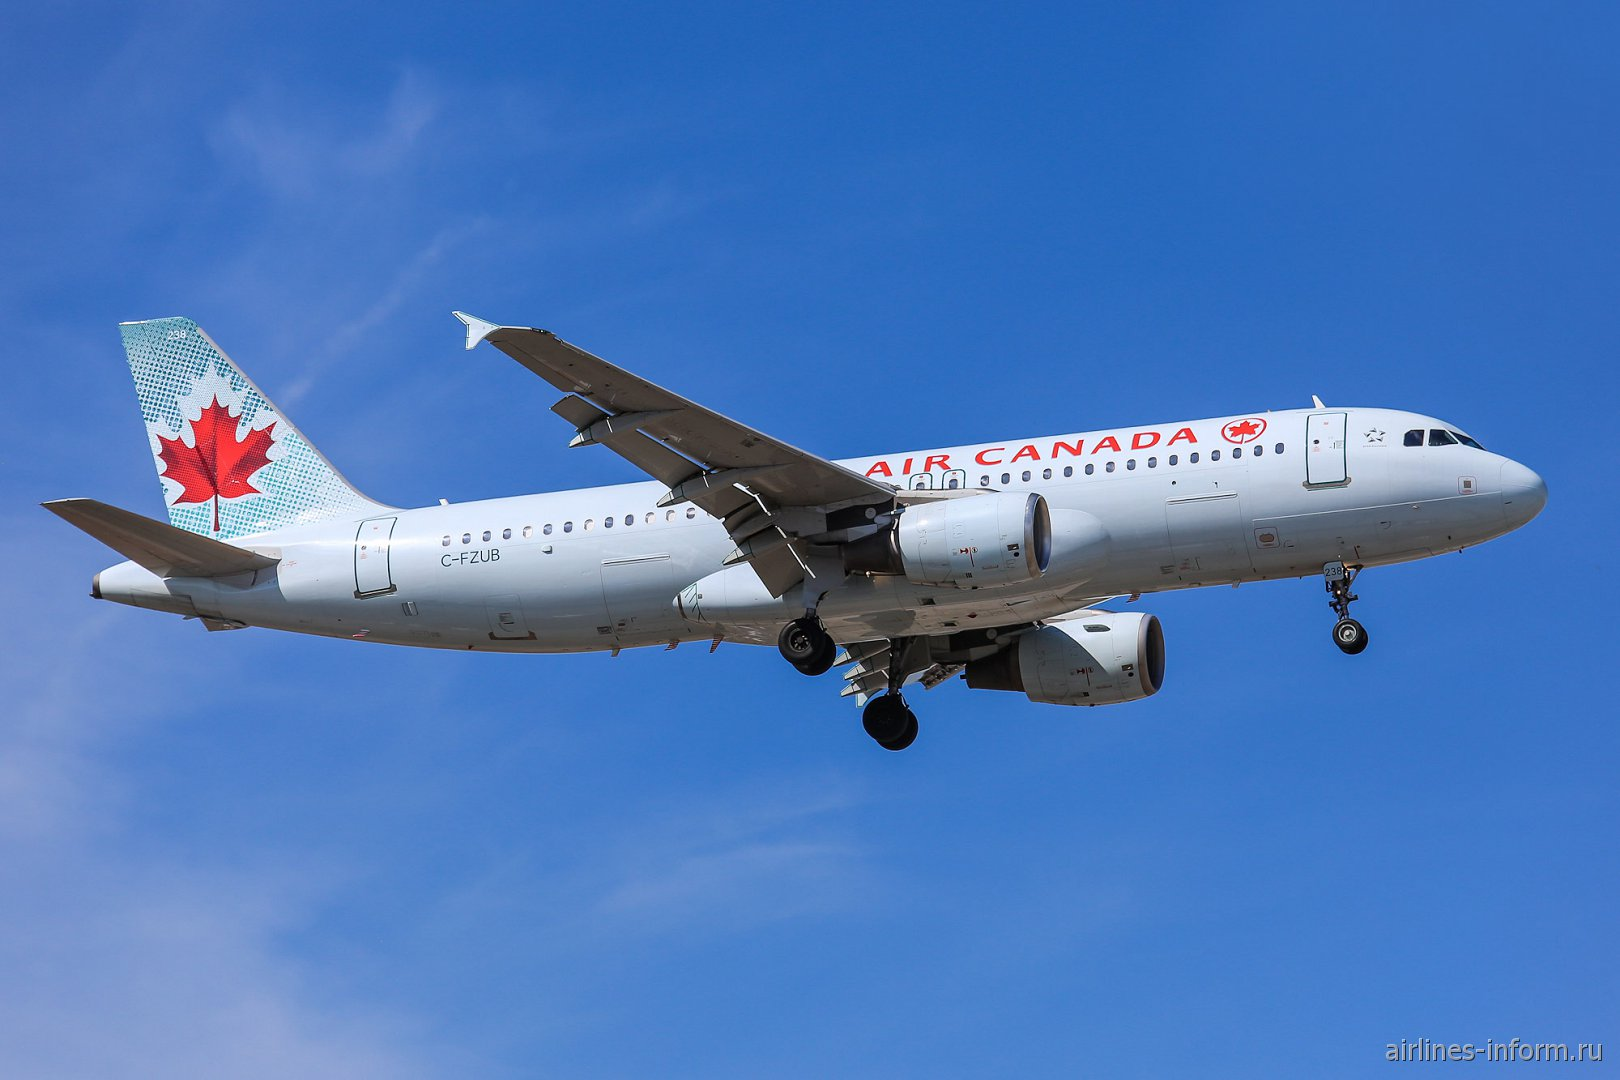 Самолет Airbus A320 C-FZUB авиакомпании Air Canada